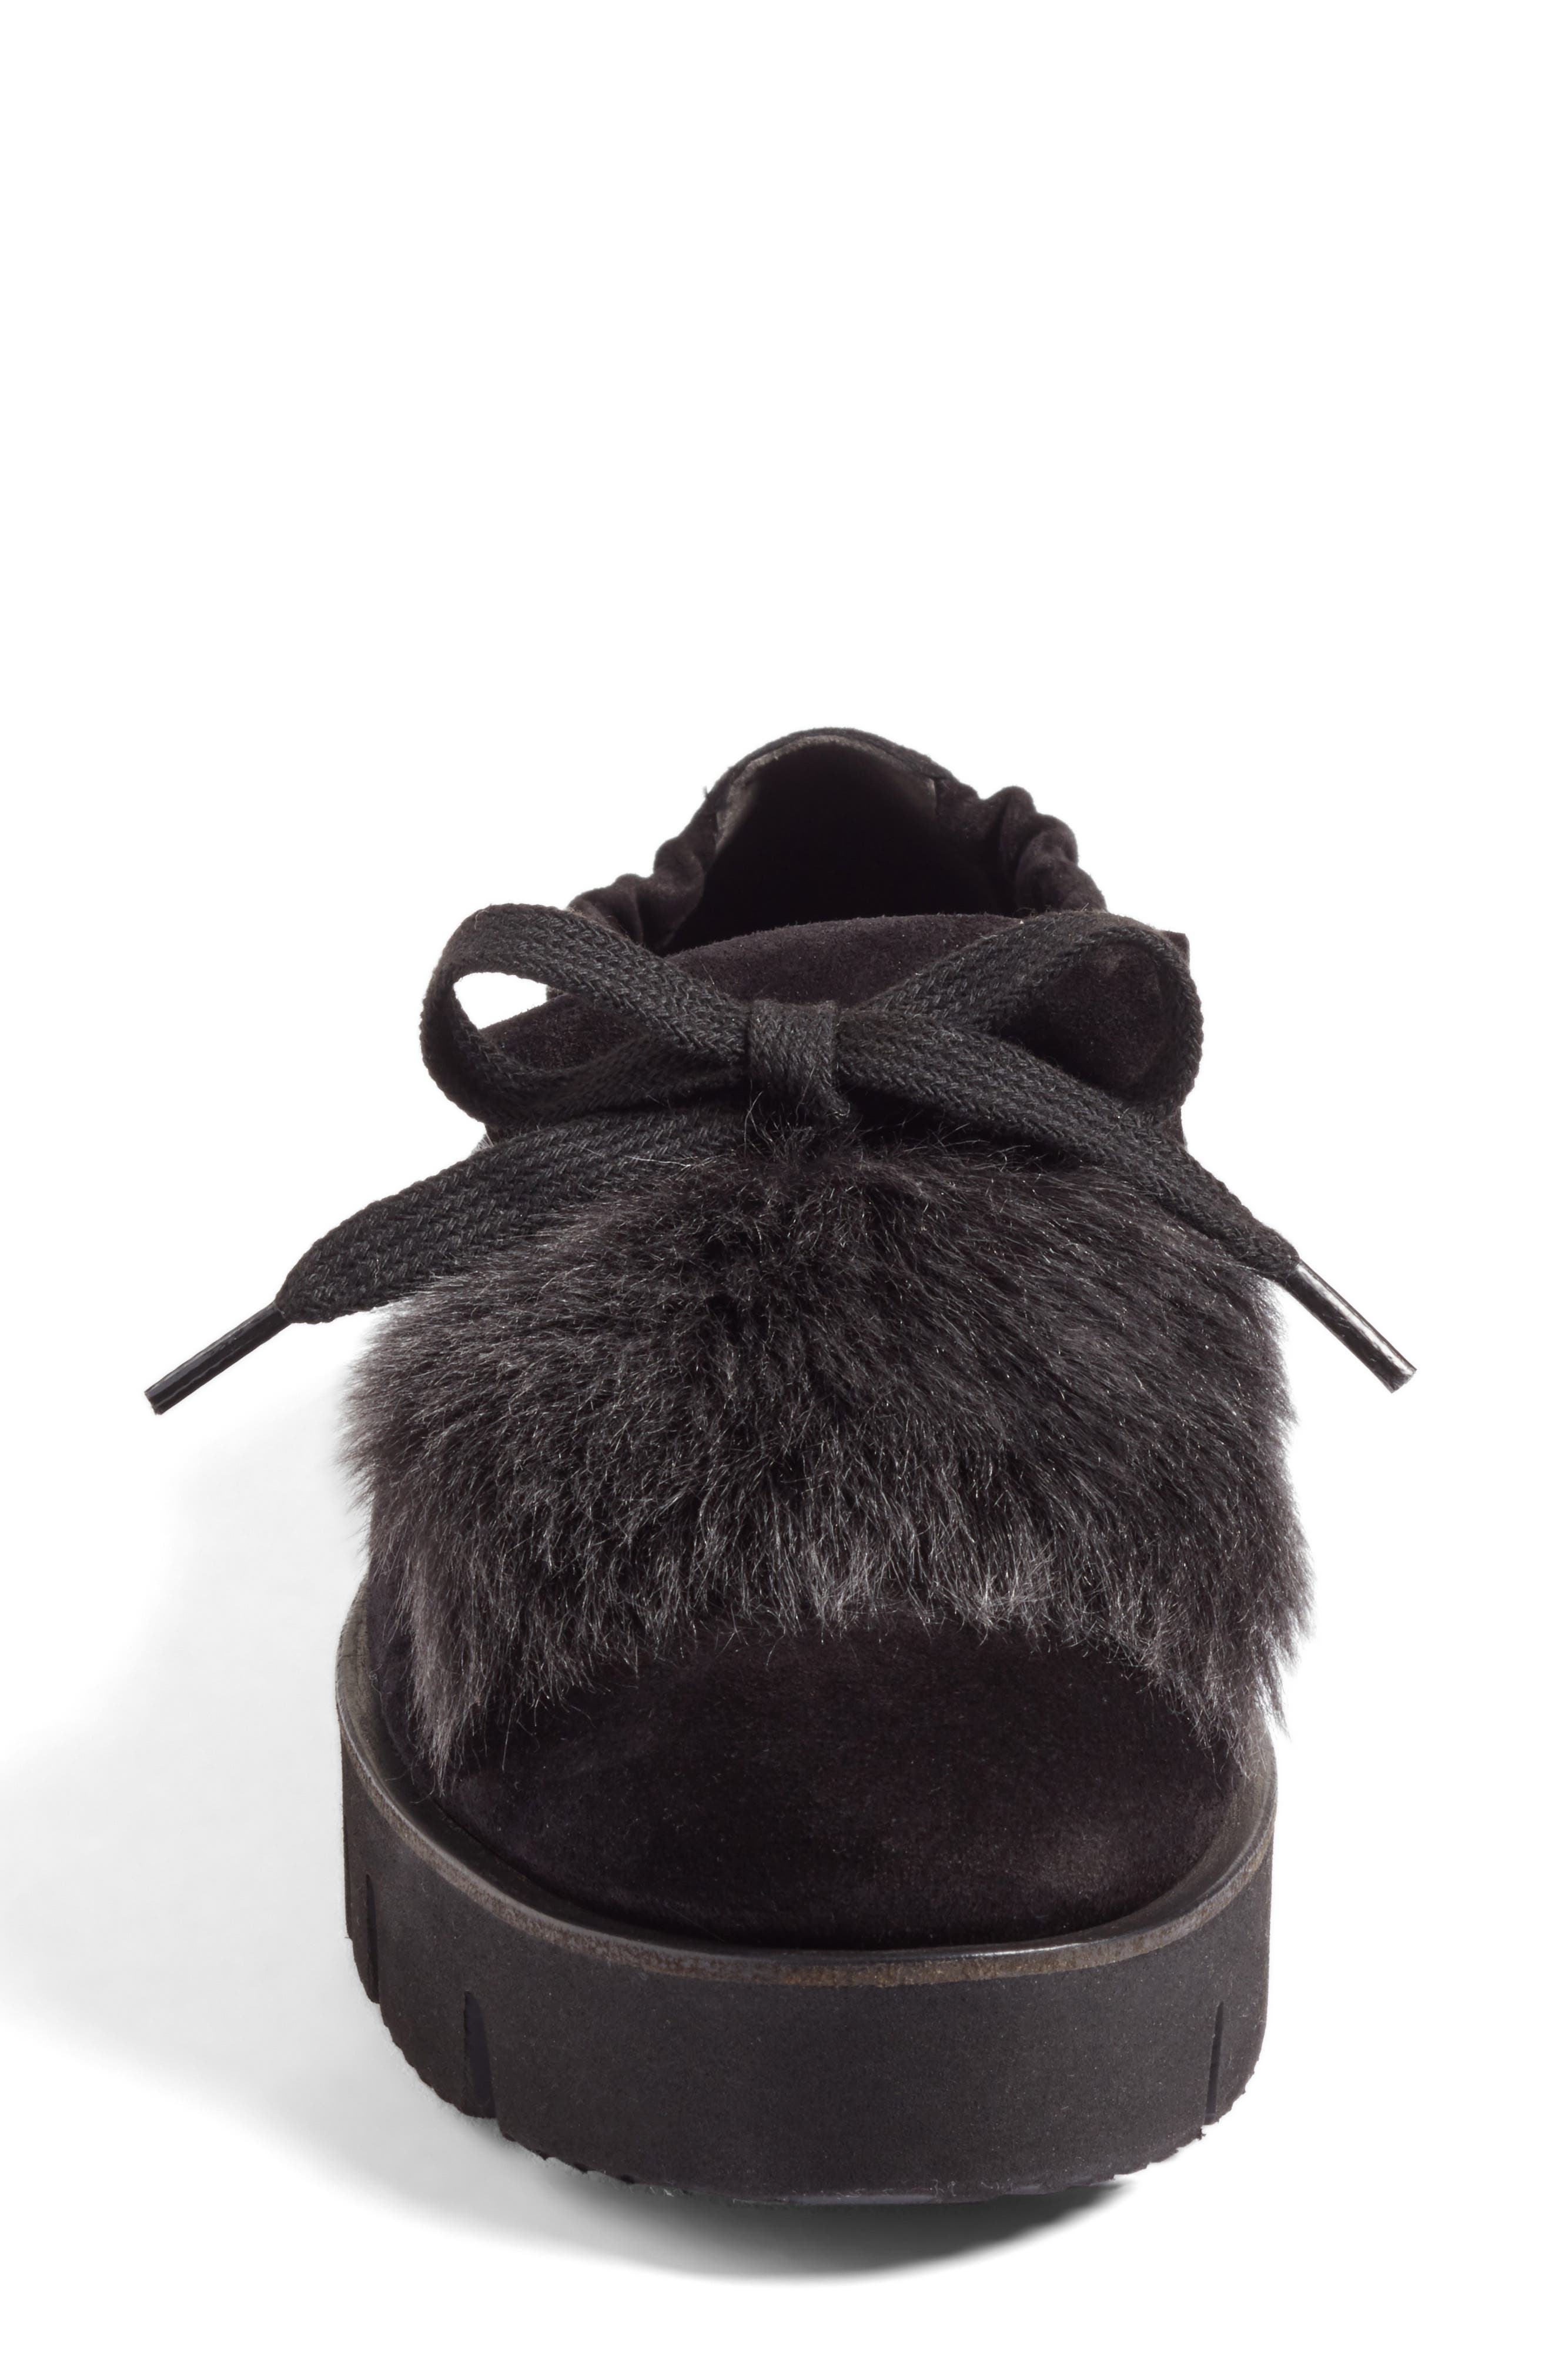 Kennel & Schmenger Malu Suede & Genuine Shearling Slip-On Sneaker,                             Alternate thumbnail 4, color,                             001